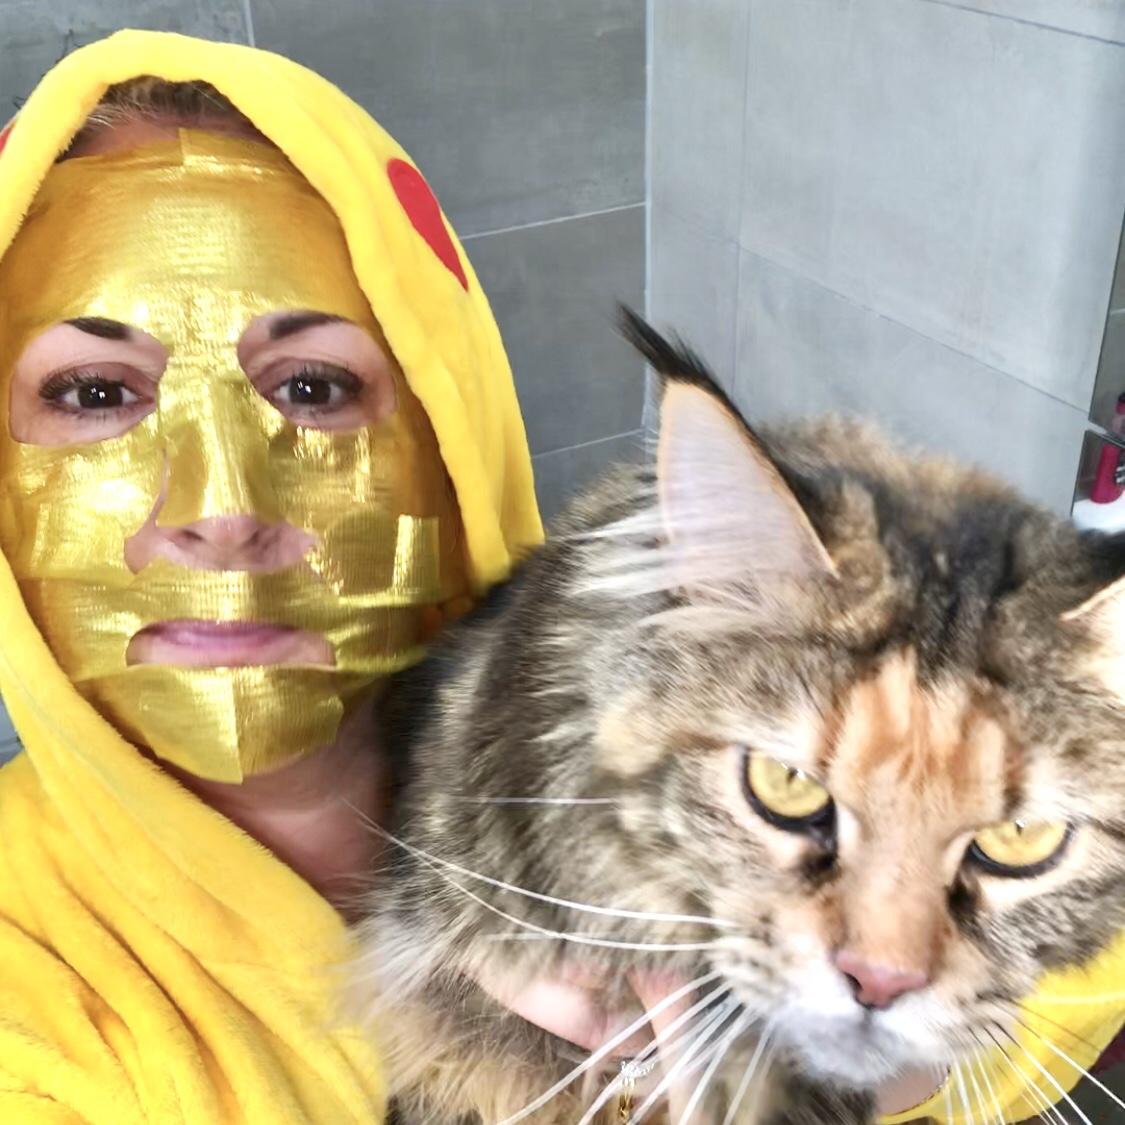 Un masque 7th Heaven en or: 24K gold firming sheet mask